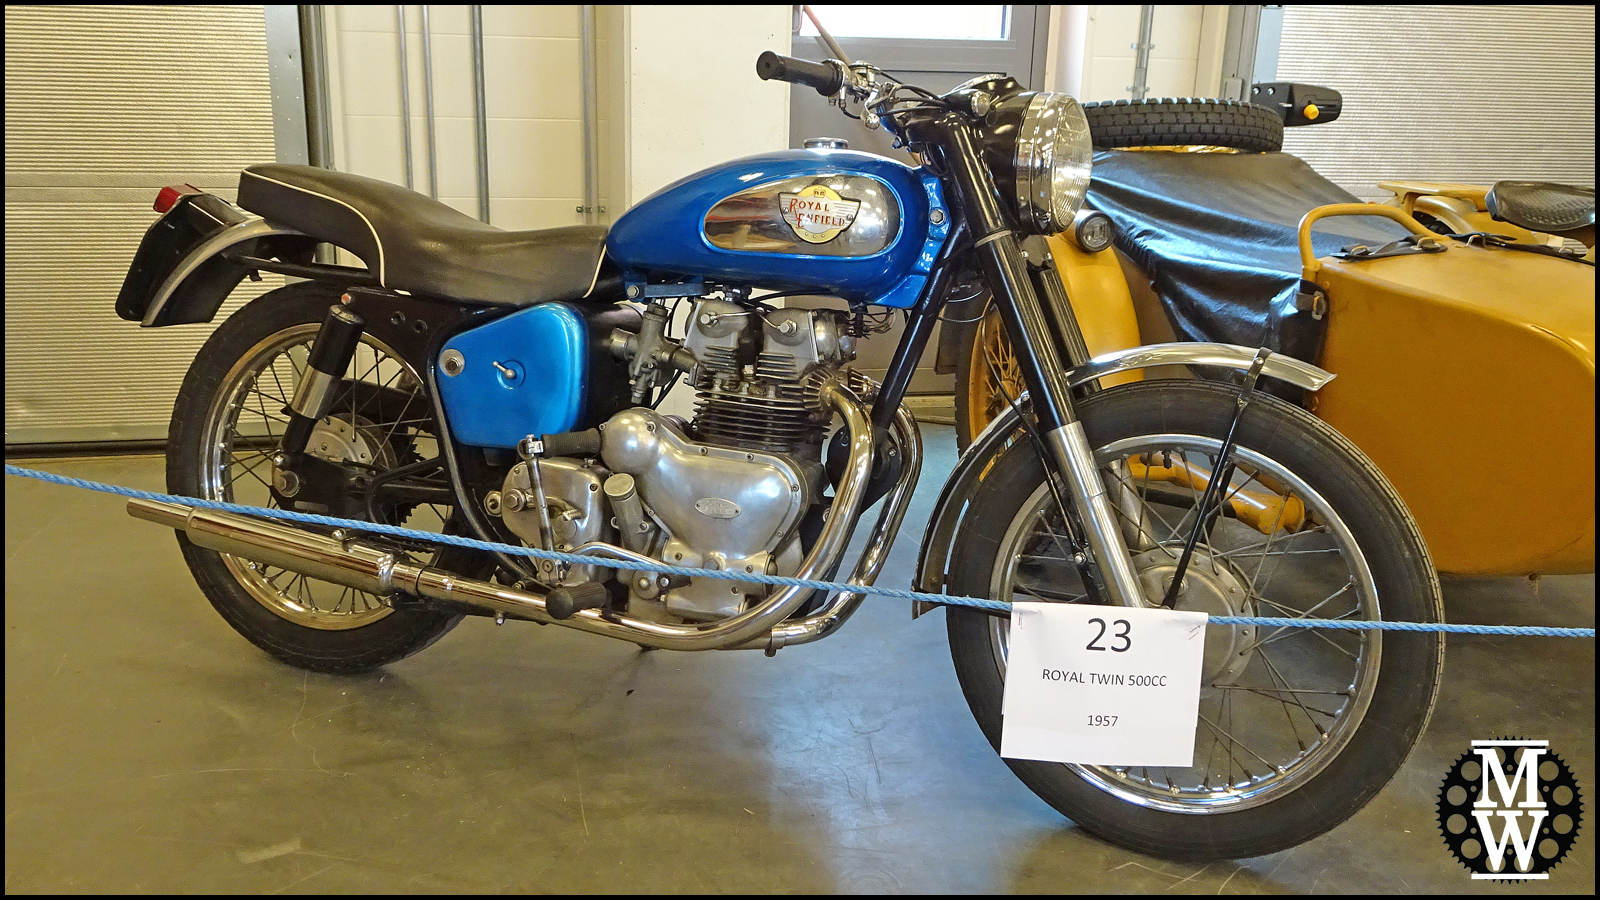 Marko's Workshop: Motorcycle in Finland for 100 years - Jubilee